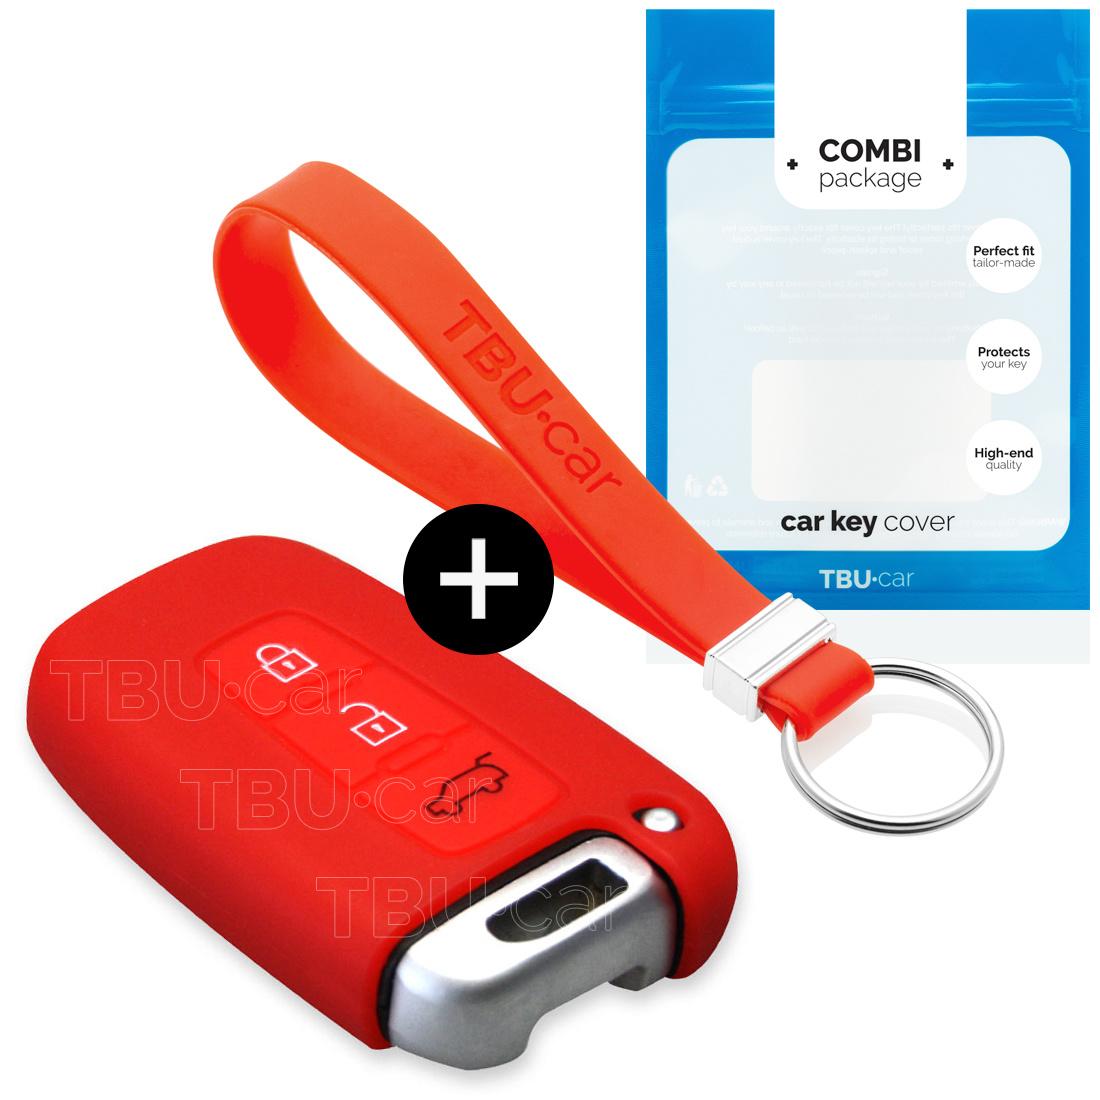 Kia Autoschlüssel Hülle - Silikon Schutzhülle - Schlüsselhülle Cover - Rott